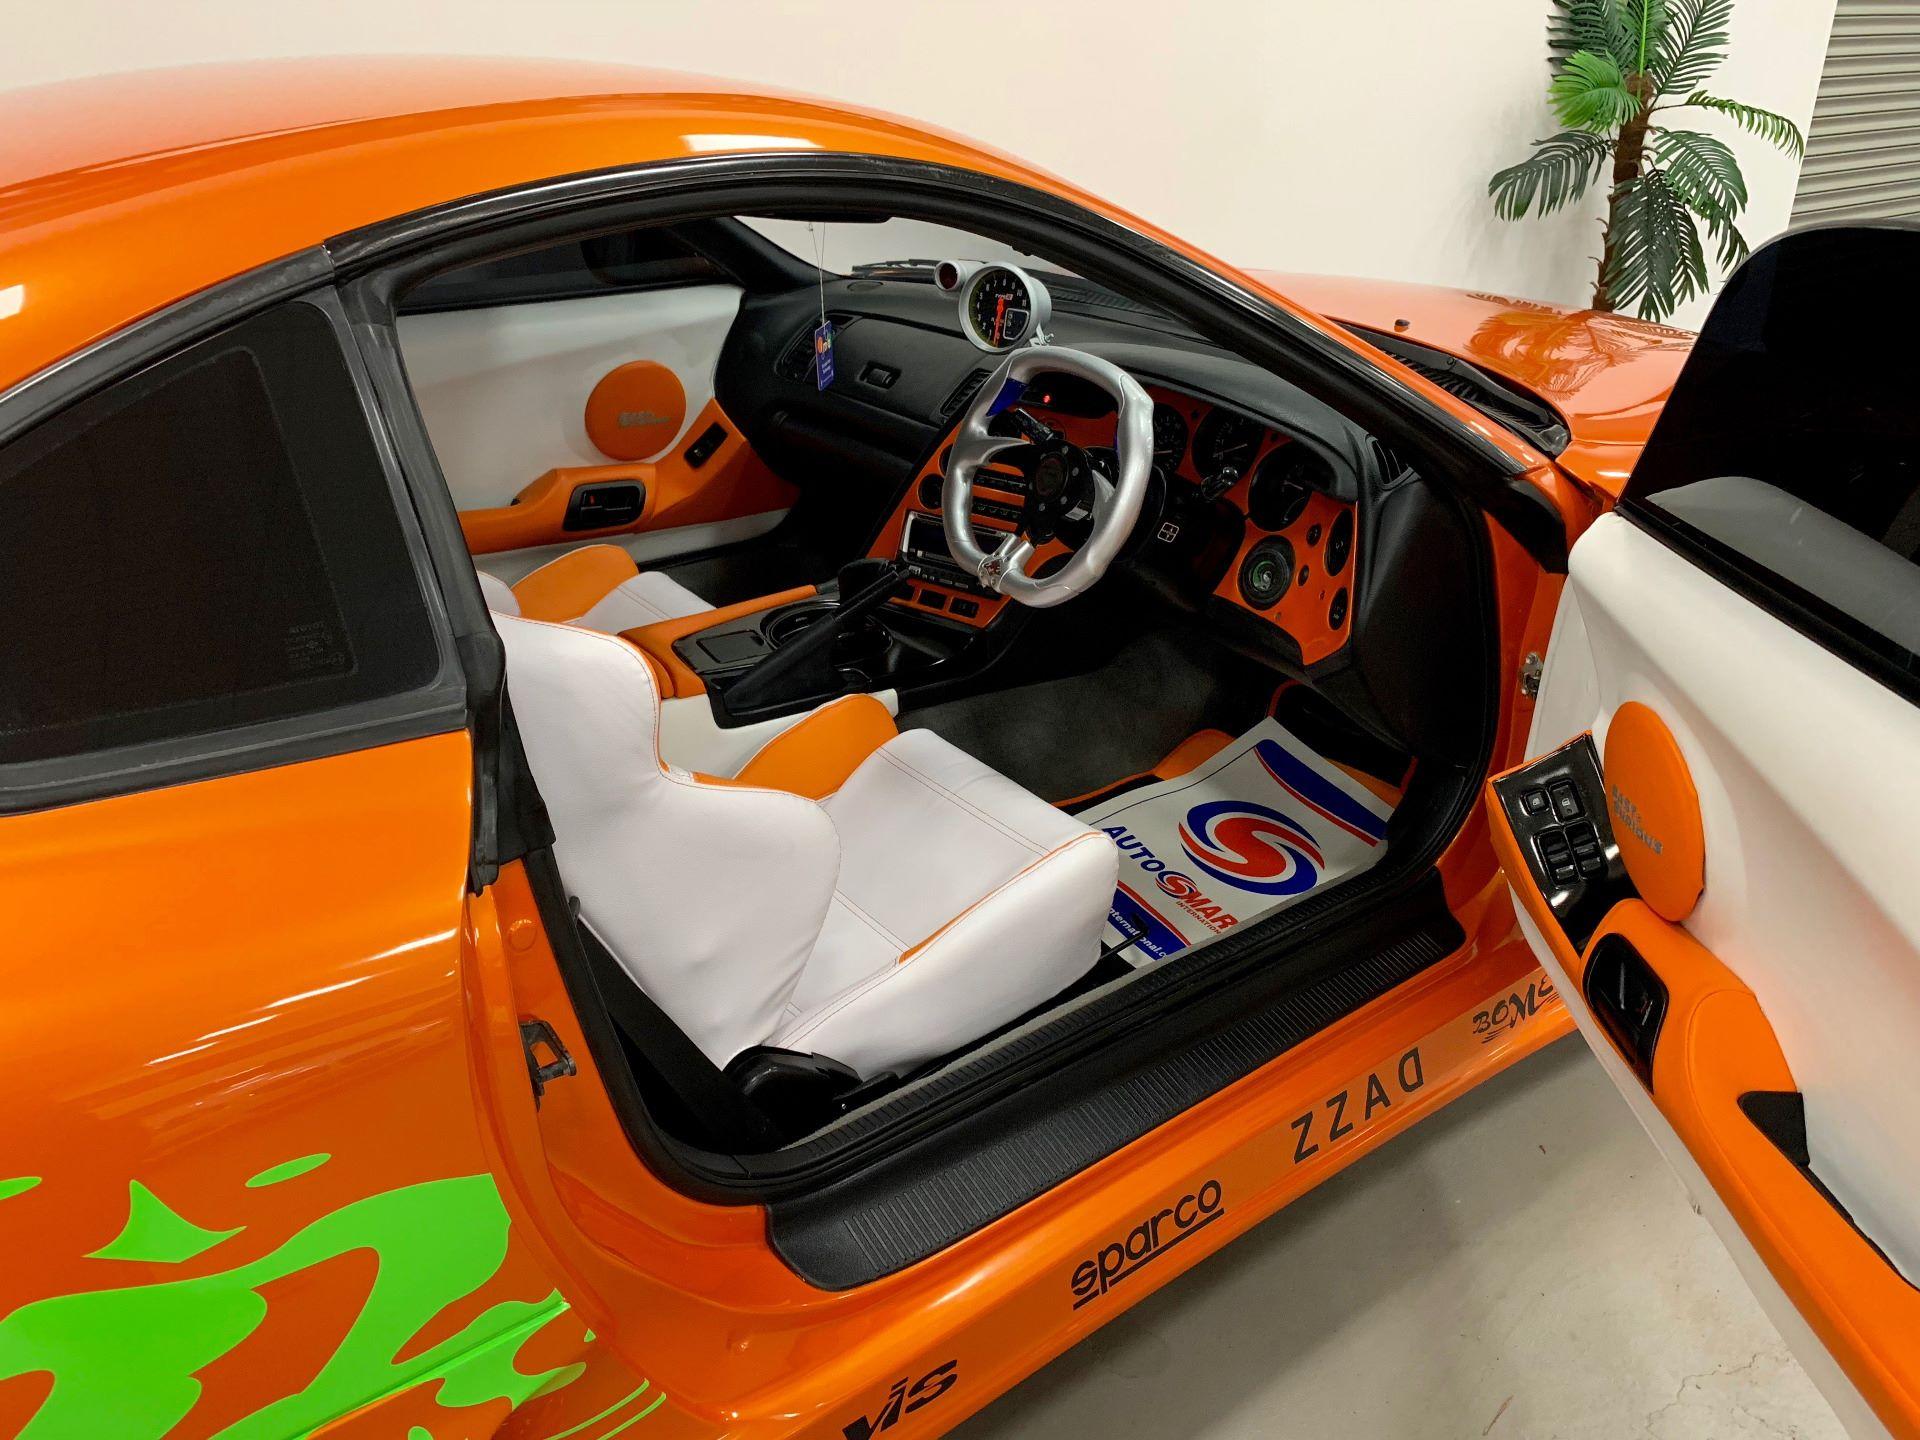 Toyota-Supra-replica-the-fast-and-the-furious-24